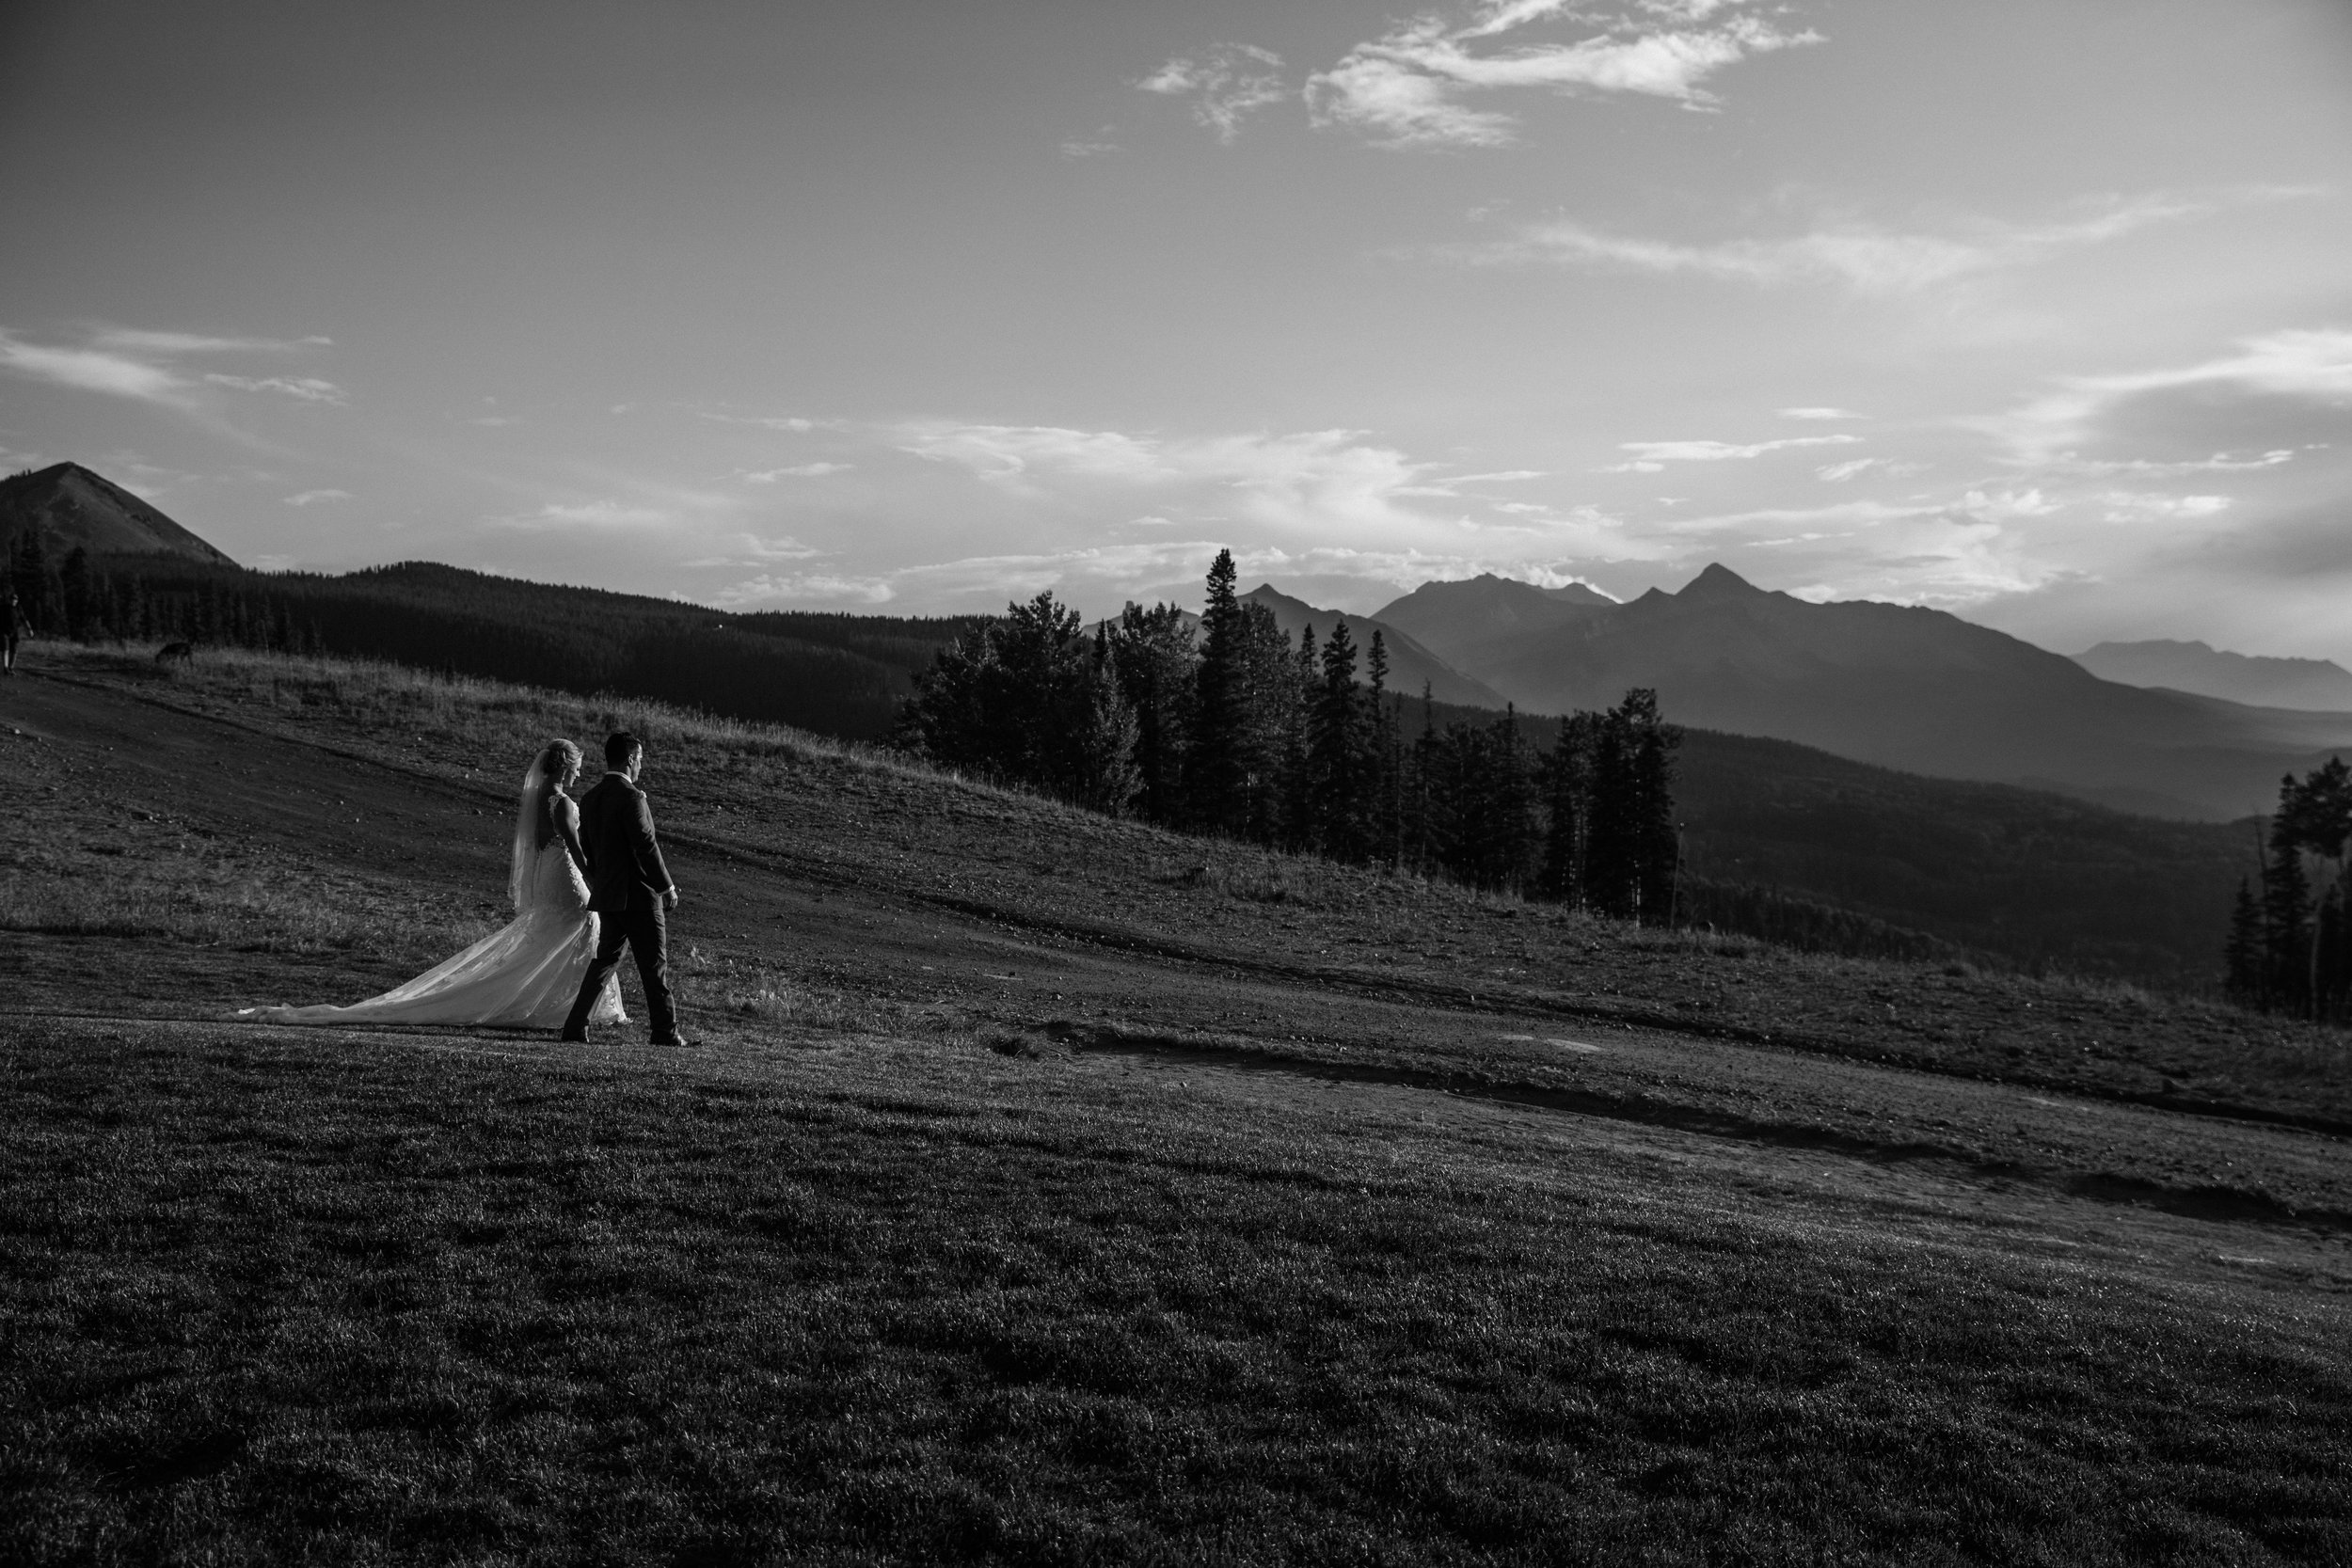 leahandashton-telluride-wedding-photography-0080.jpg